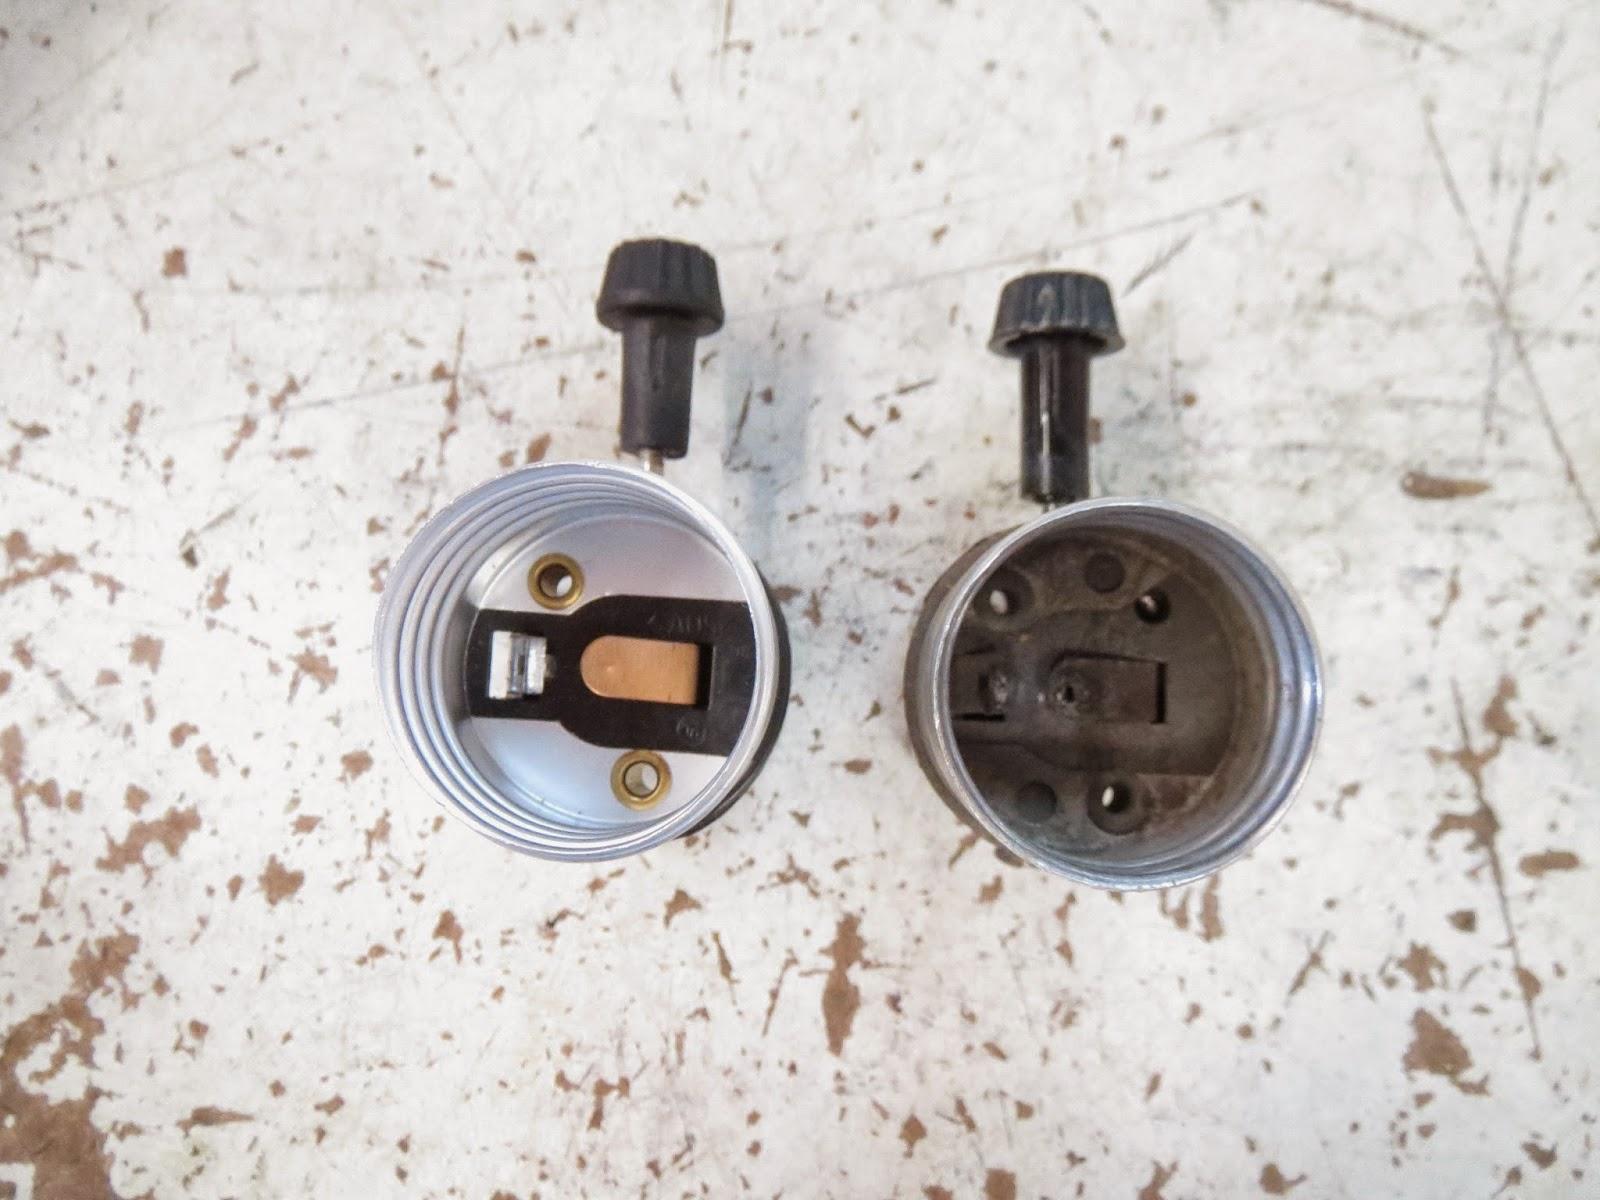 Lamp Parts and Repair | Lamp Doctor: 3 Way Sockets Vs. 3 ...